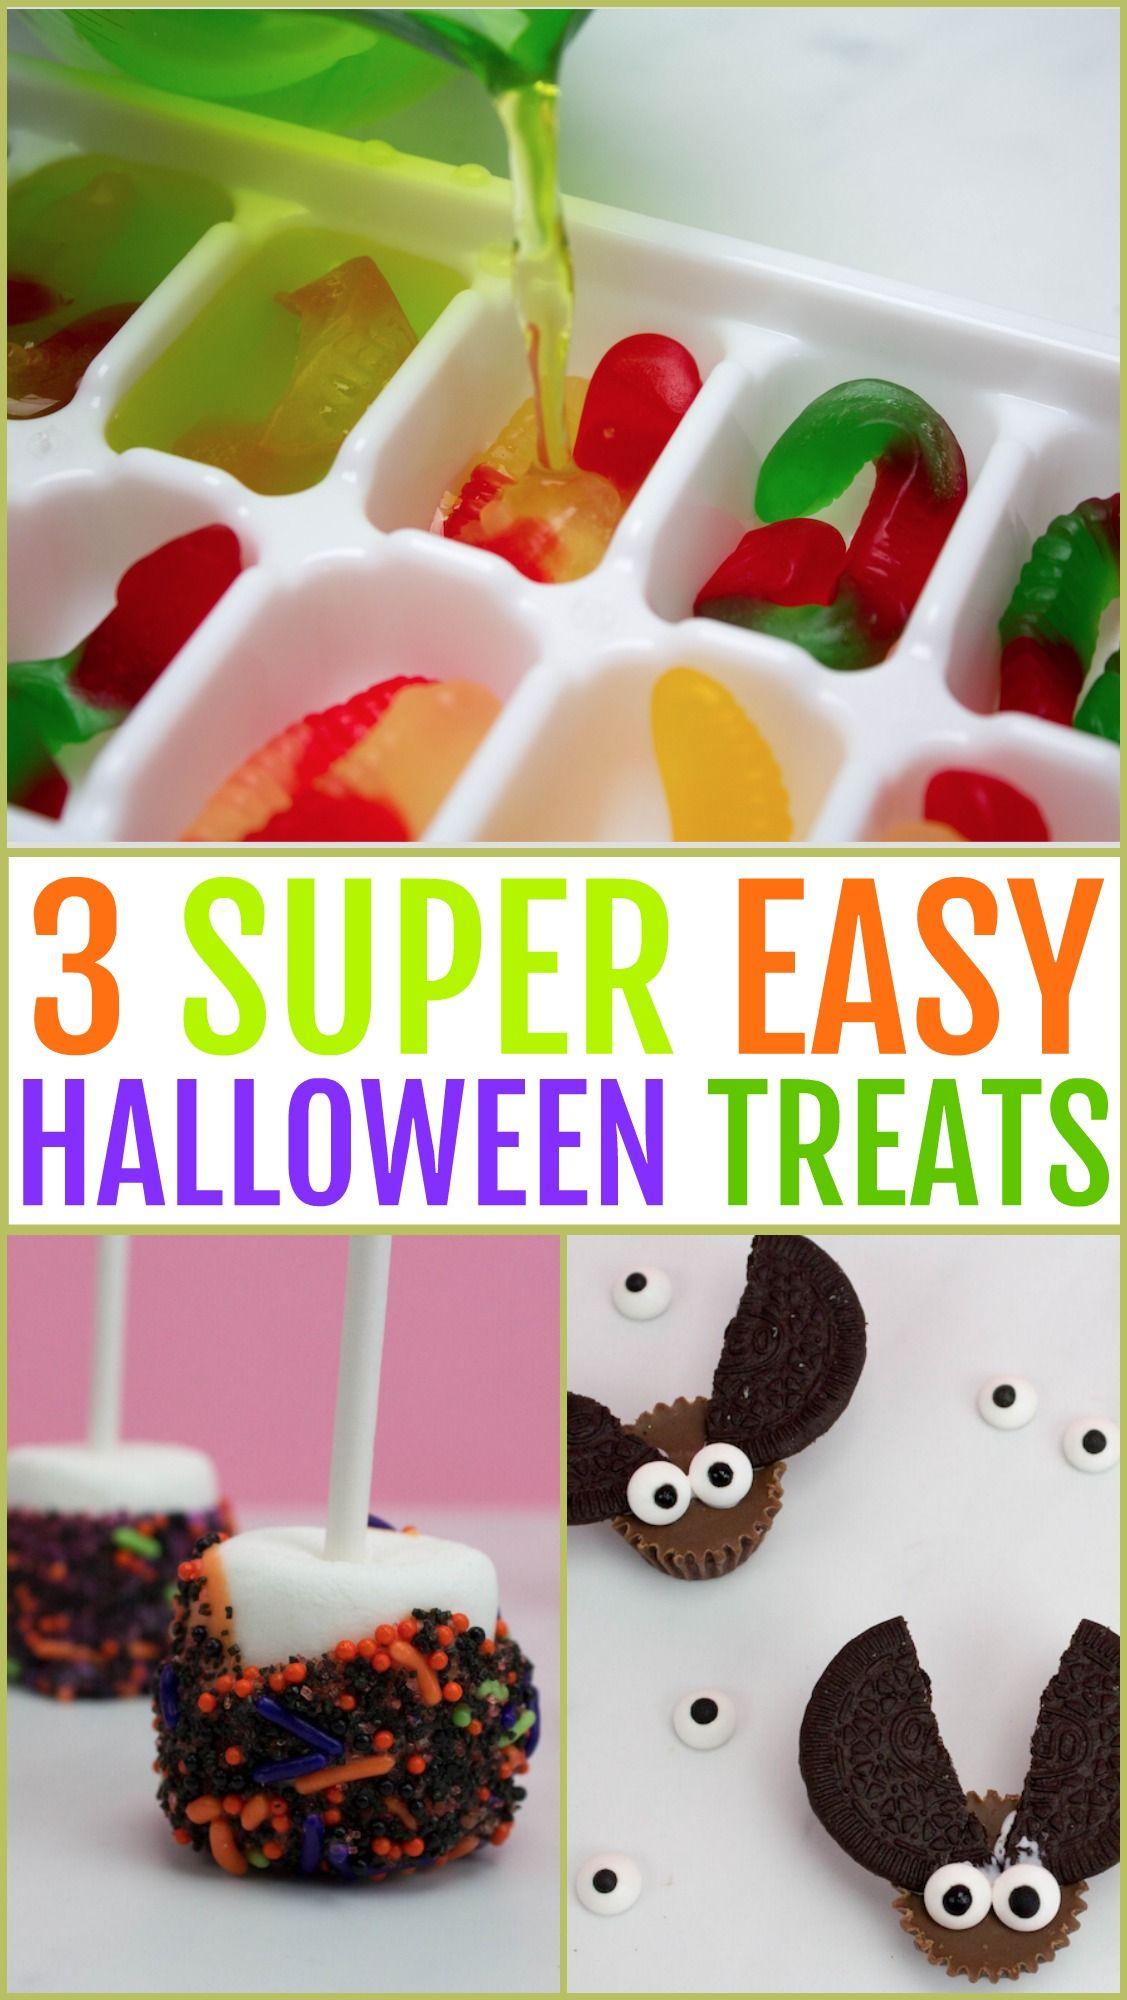 3 Easy Diy Halloween Treats Halloween Food For Party Halloween